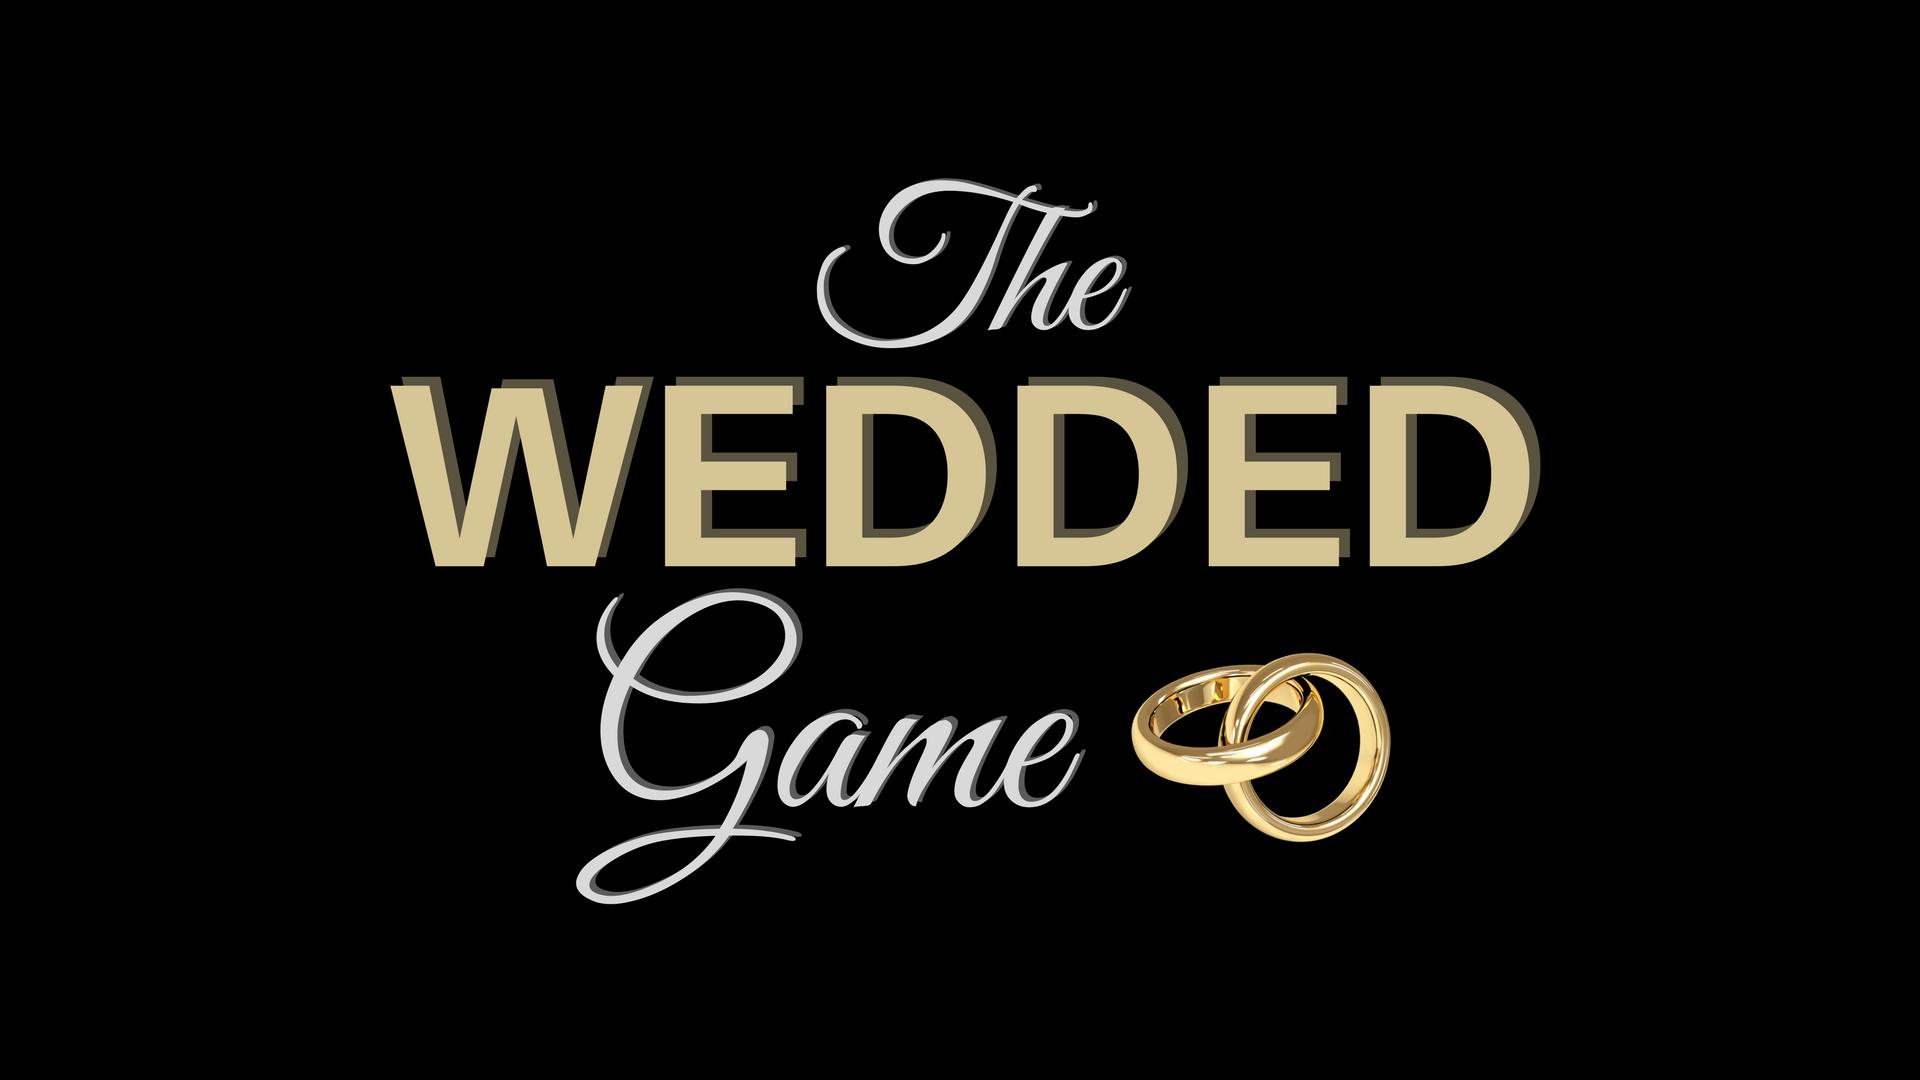 Wedded game 1920x1080